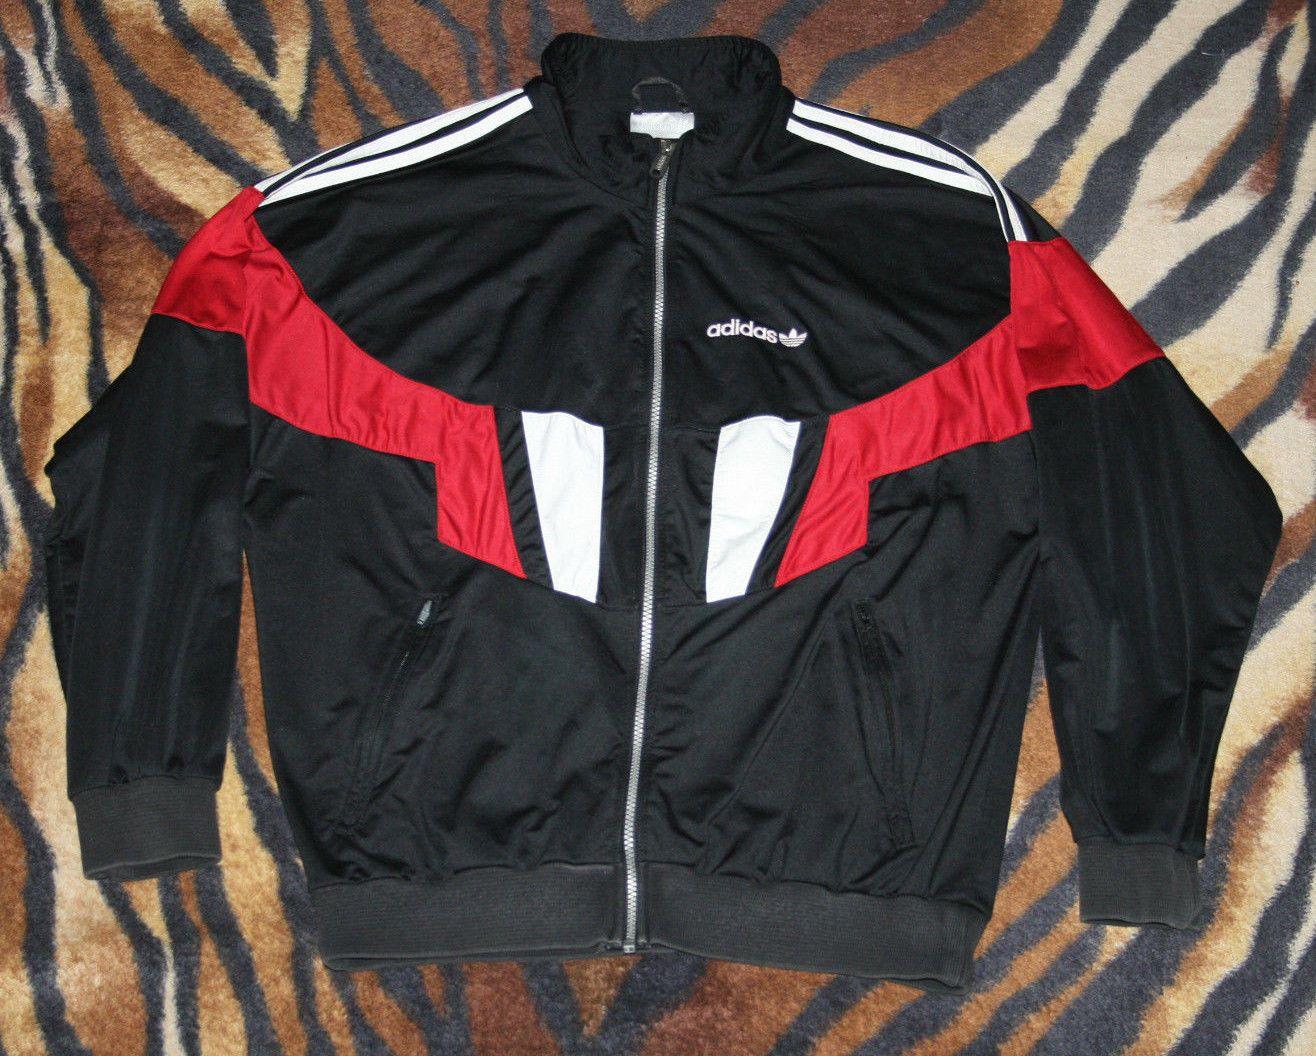 3e535bad4b12 adidas track jacket zip red black black 90 d6 f180 windbreaker retro  transformer